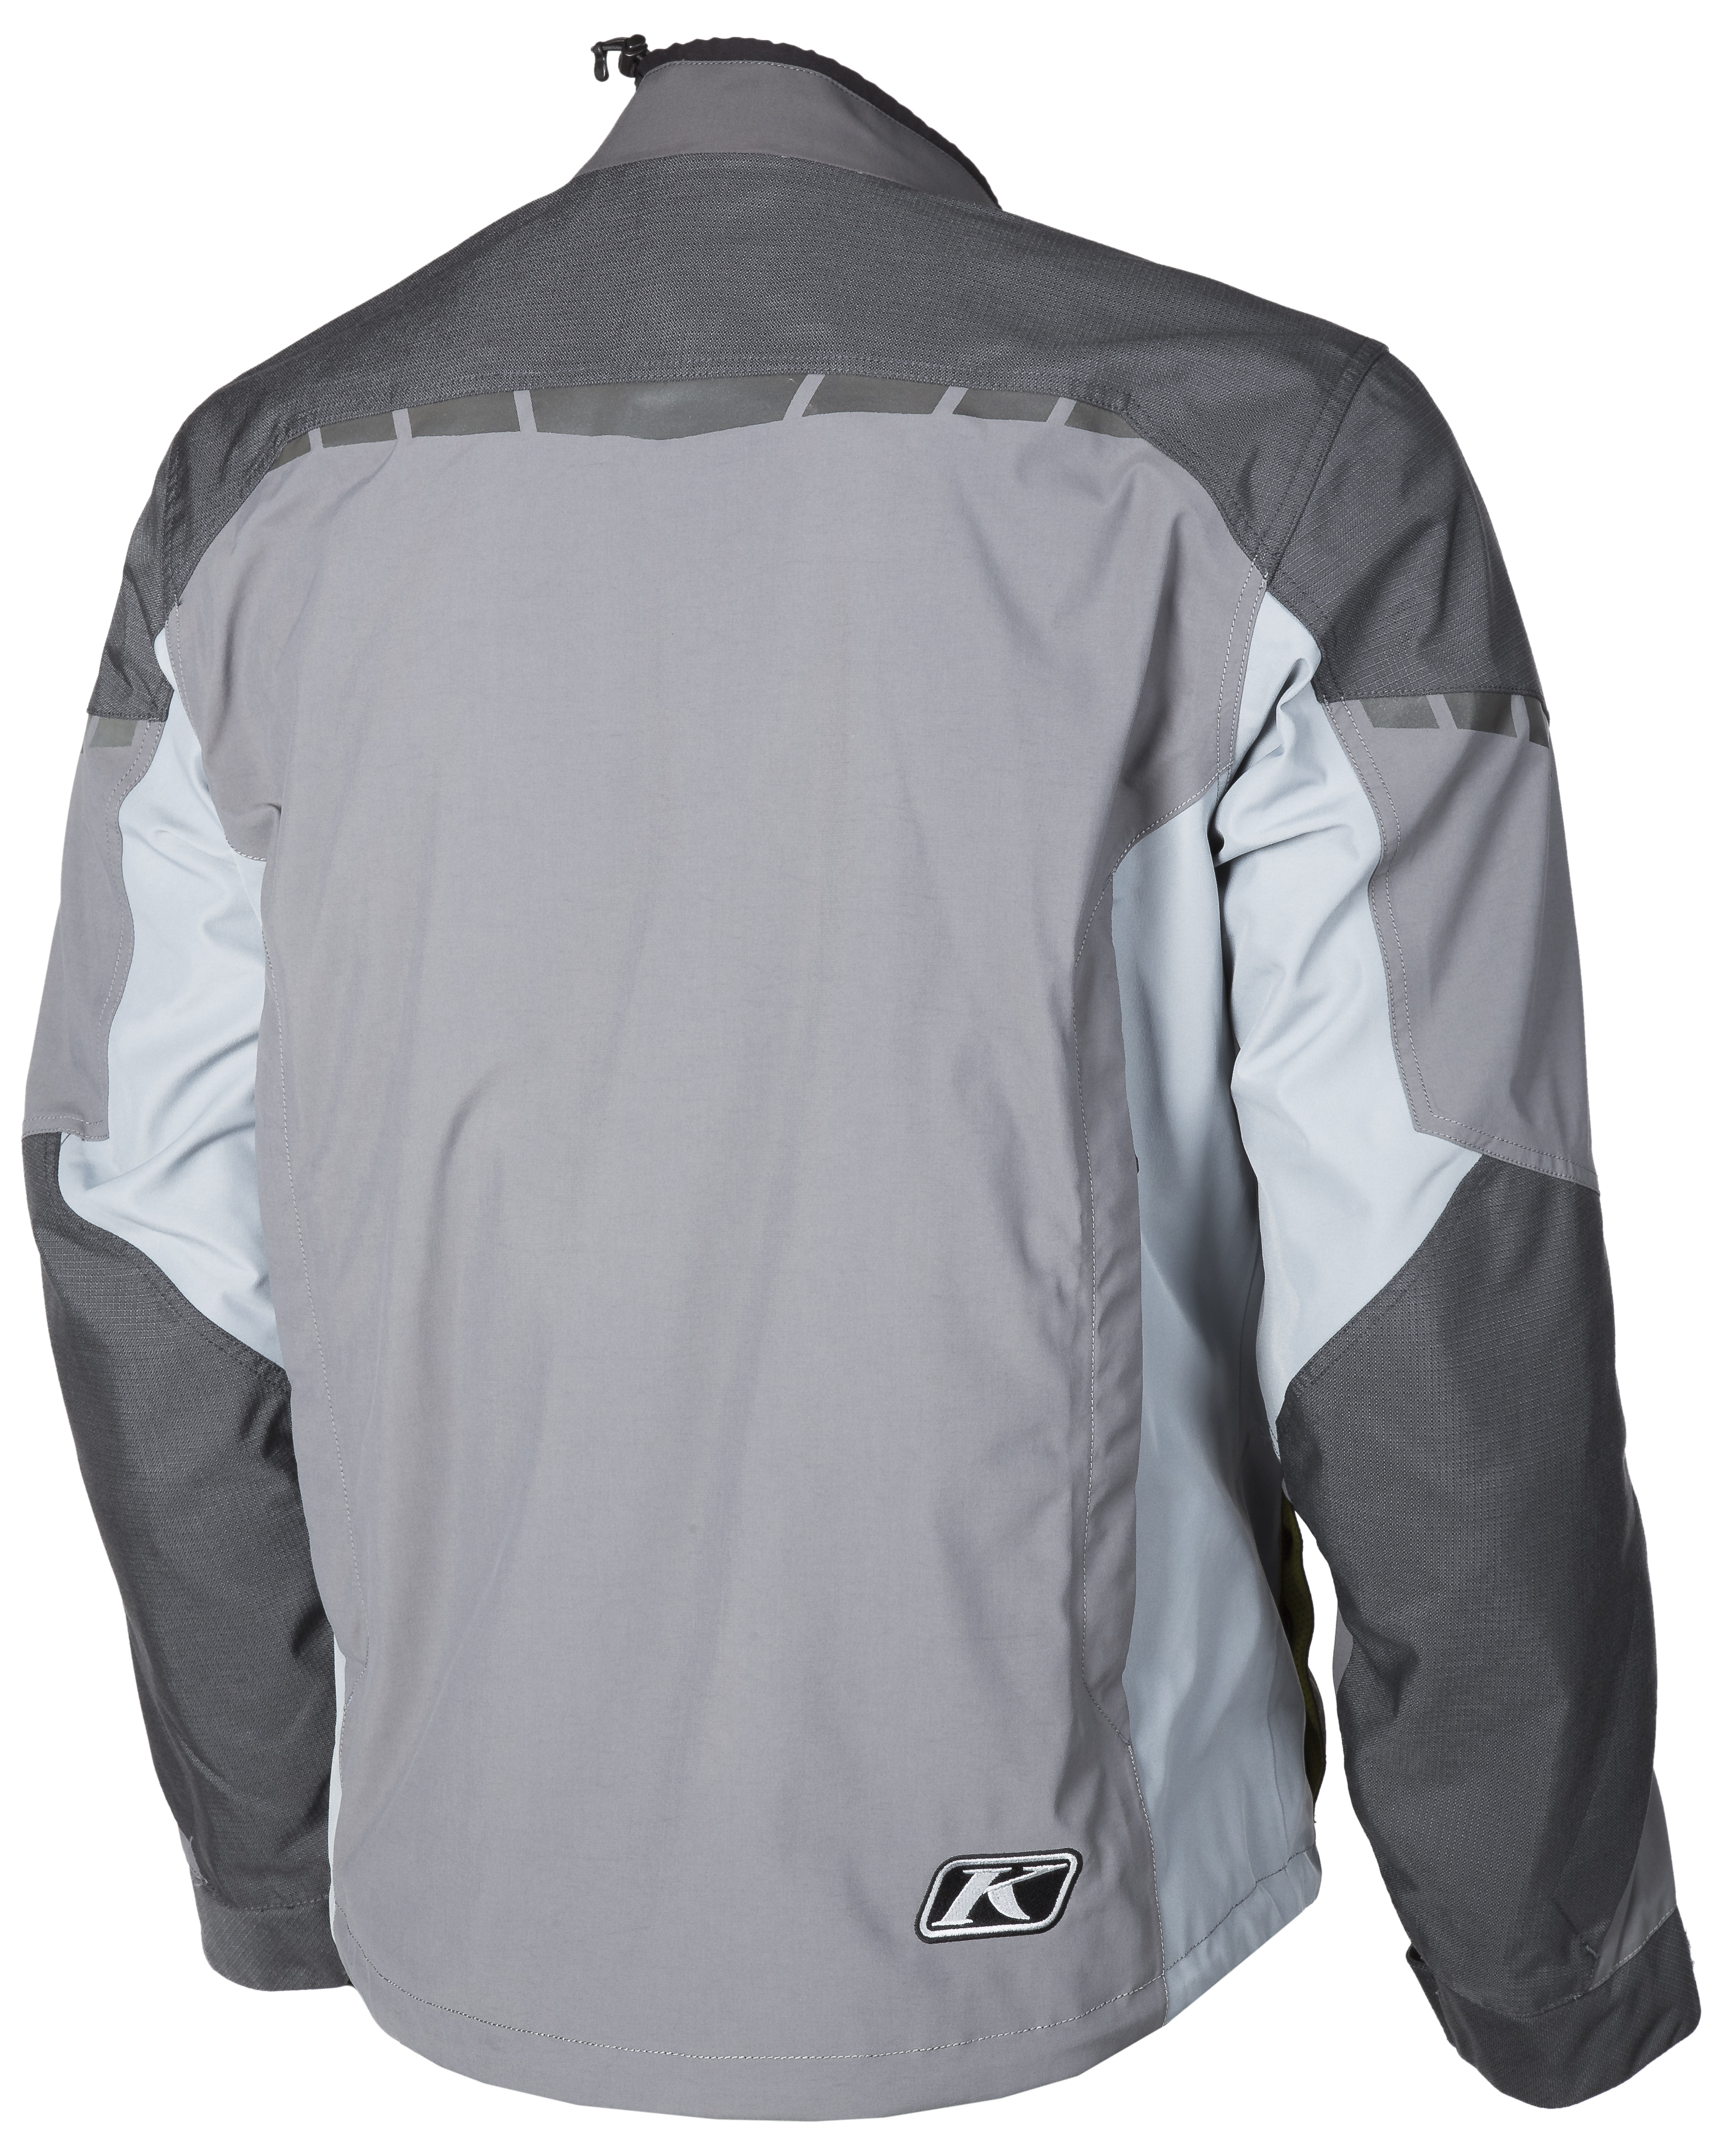 6029-001-600 Carlsbad Jacket D1